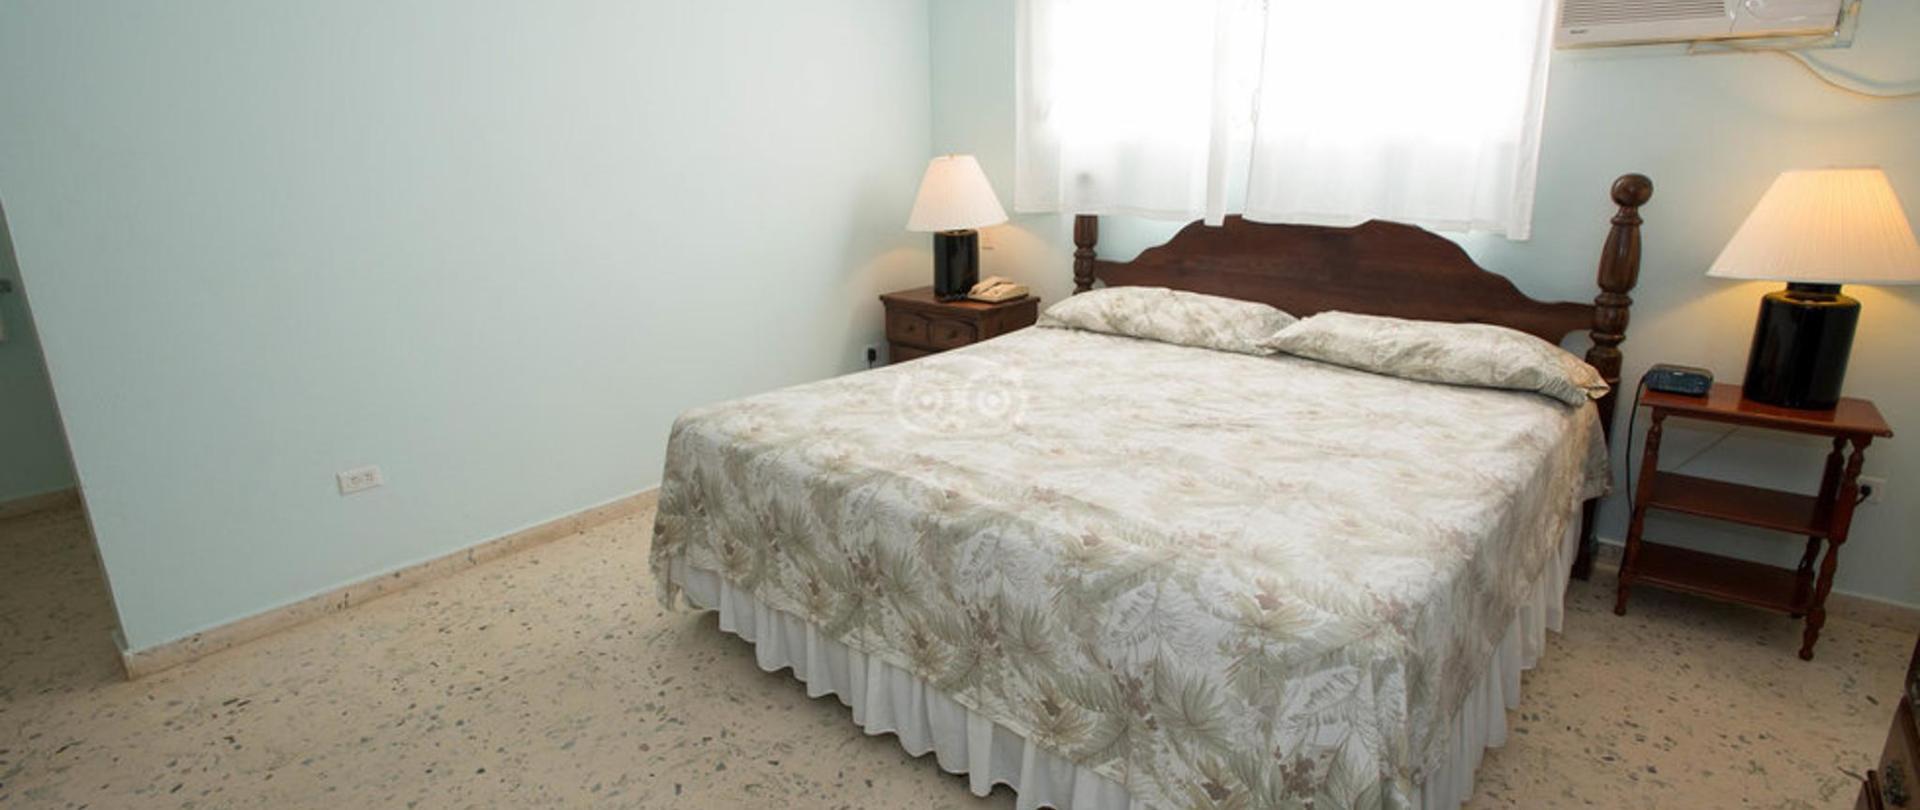 King Suite Vistalmar Aruba Accommodation.jpg